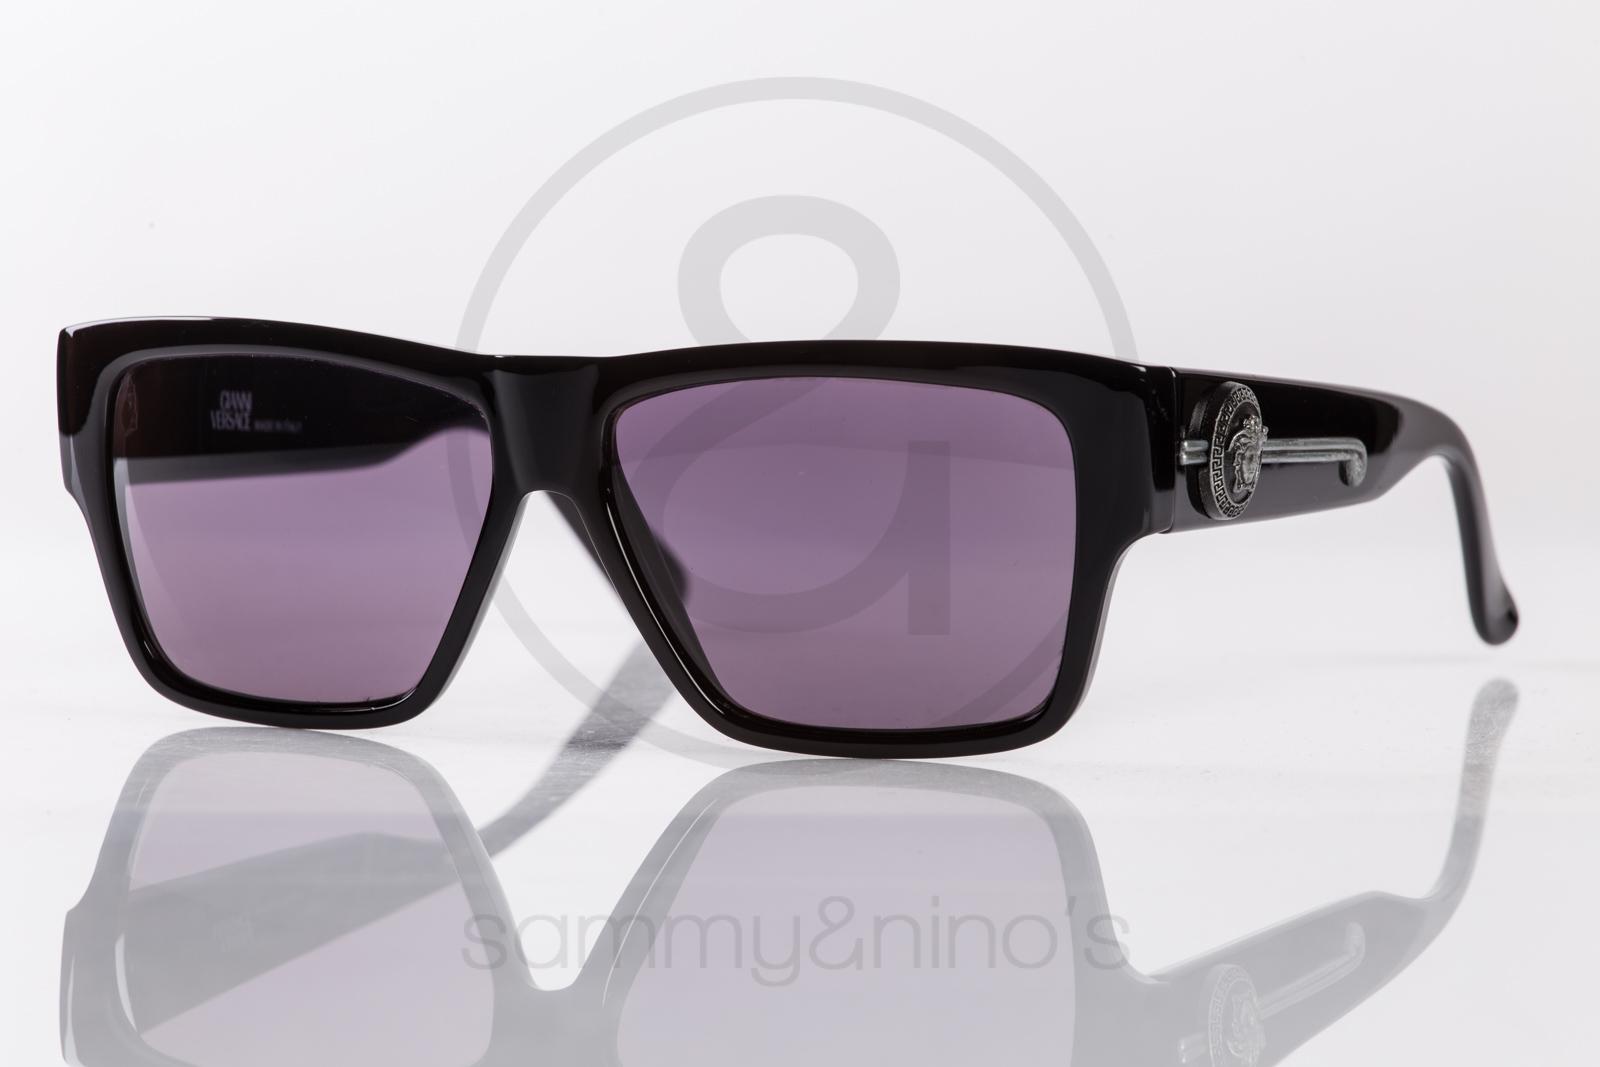 ea2b5f599e8 Gianni Versace 372/n 852 – Sammy & Nino's Store